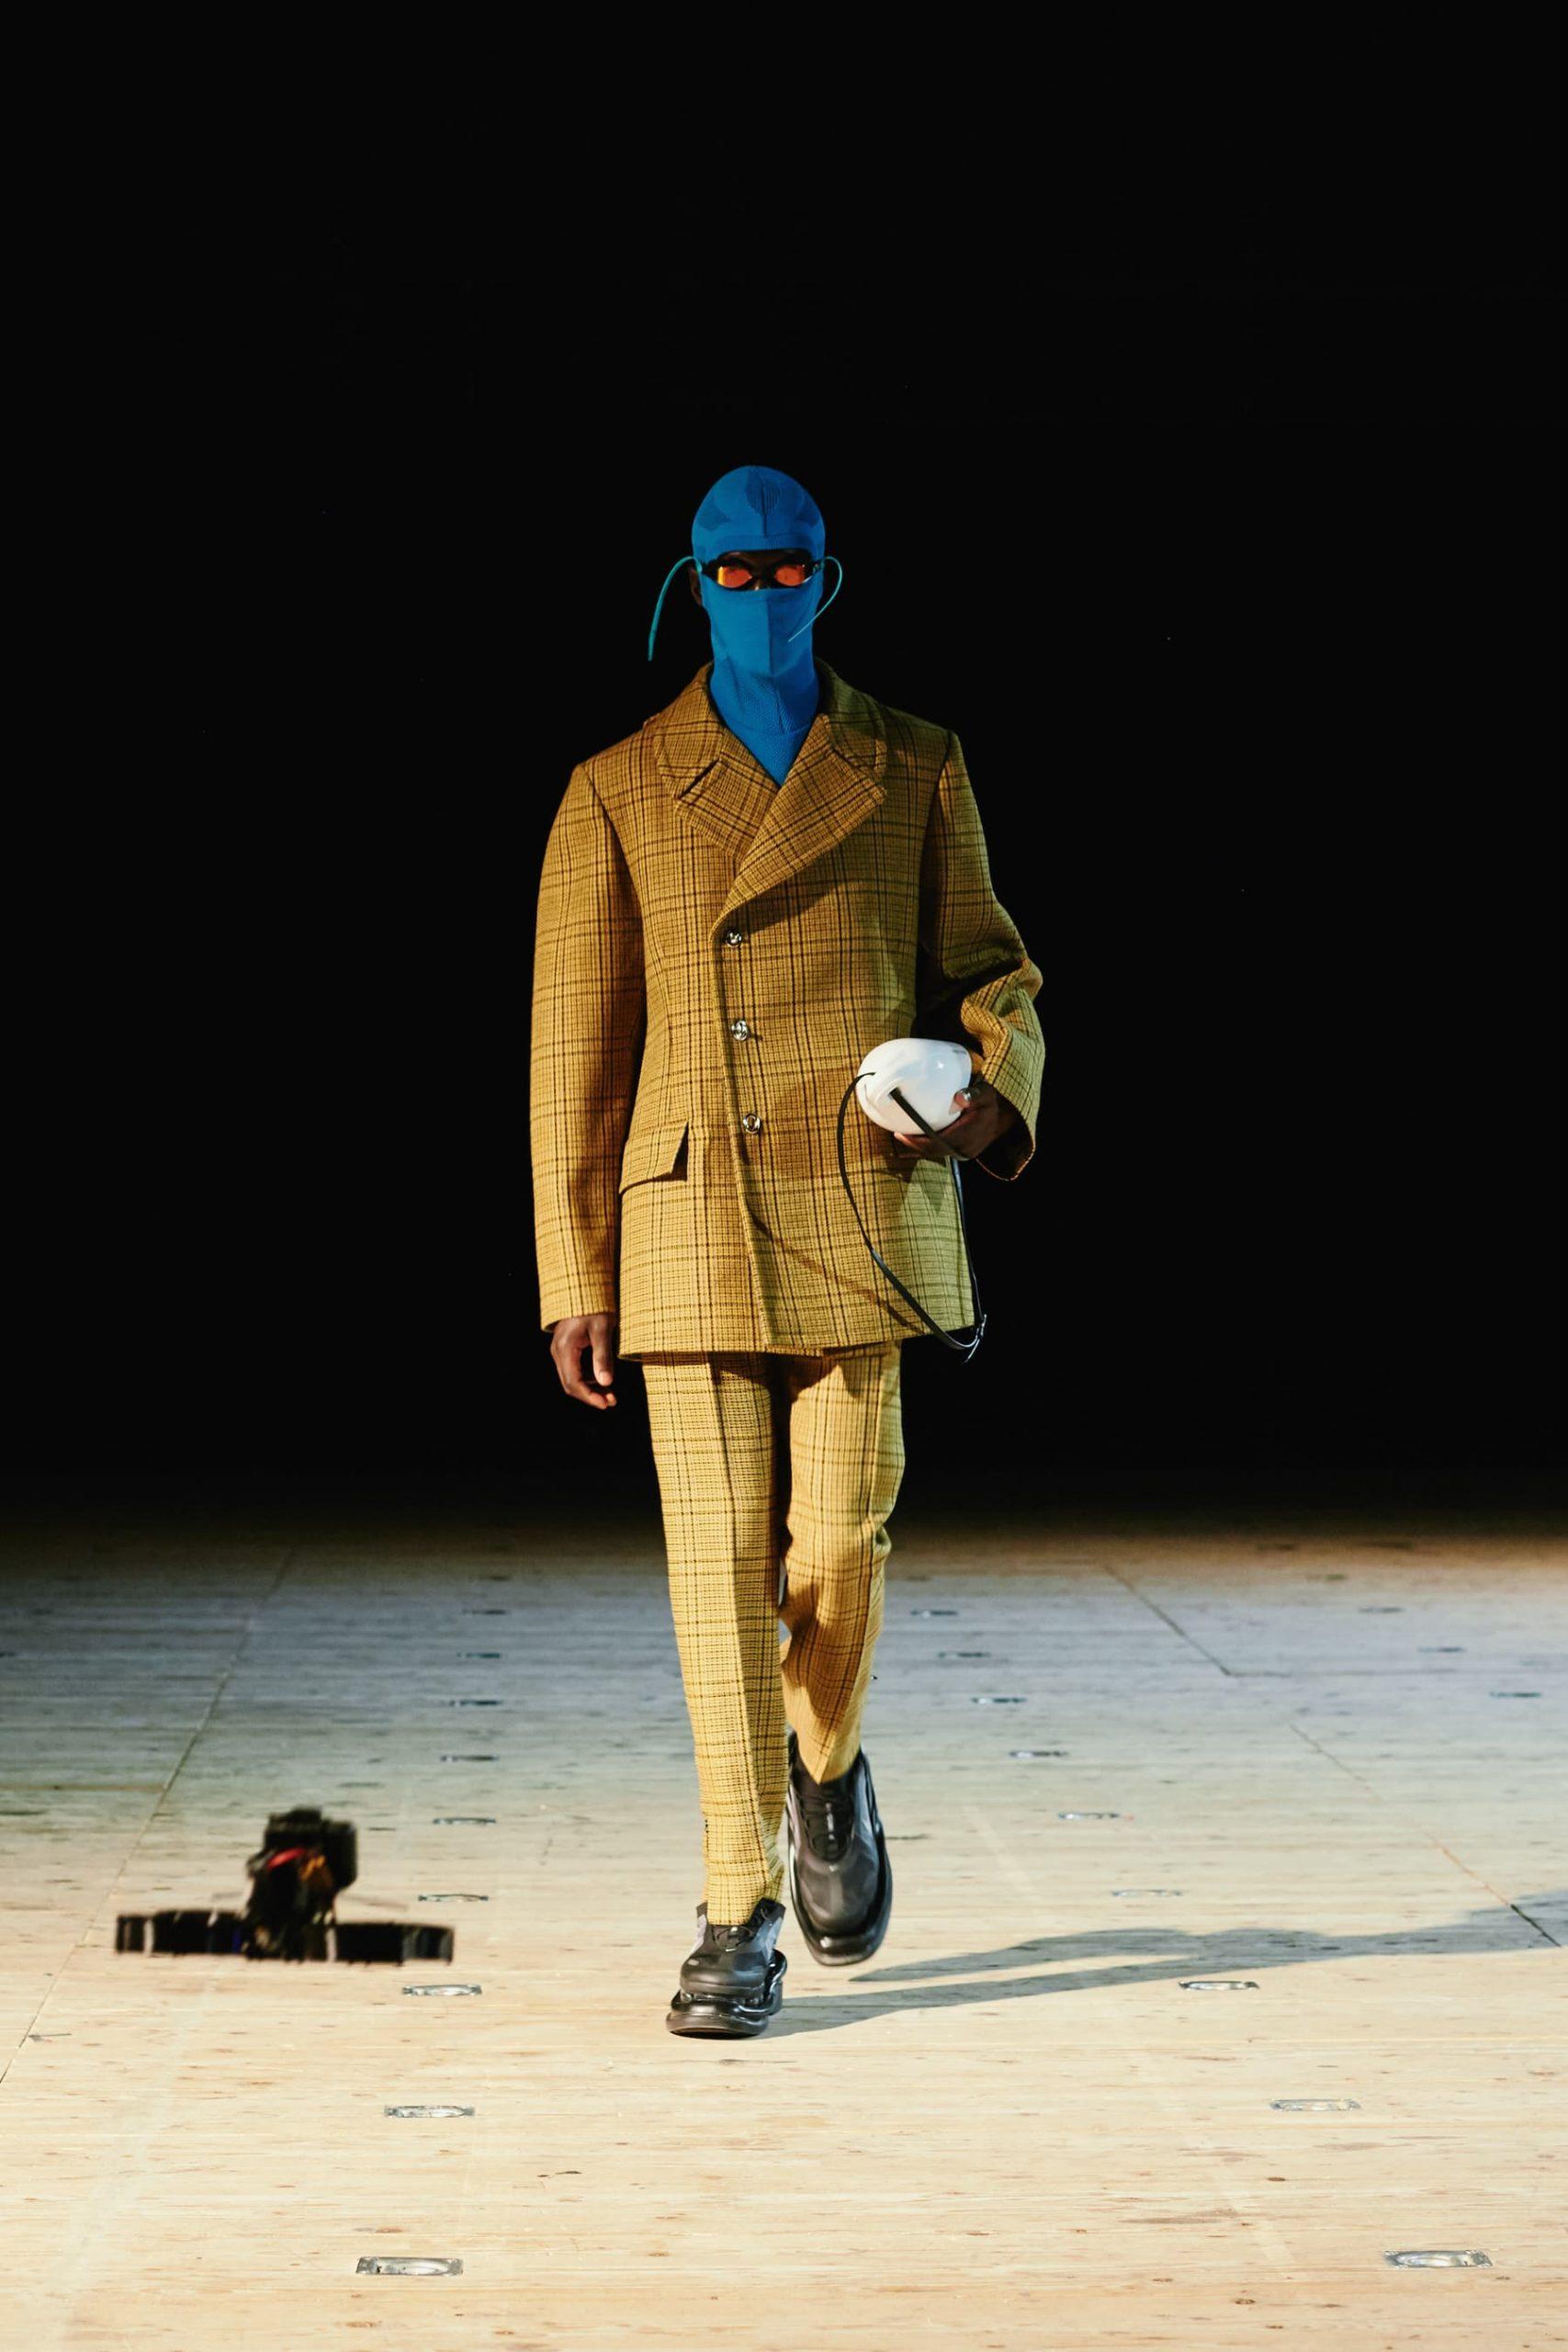 Review of Dries Van Noten, Valette Studio, Boramy Viguier, Yohji Yamamoto, & Botter Fall 2021 Men's Fashion Shows